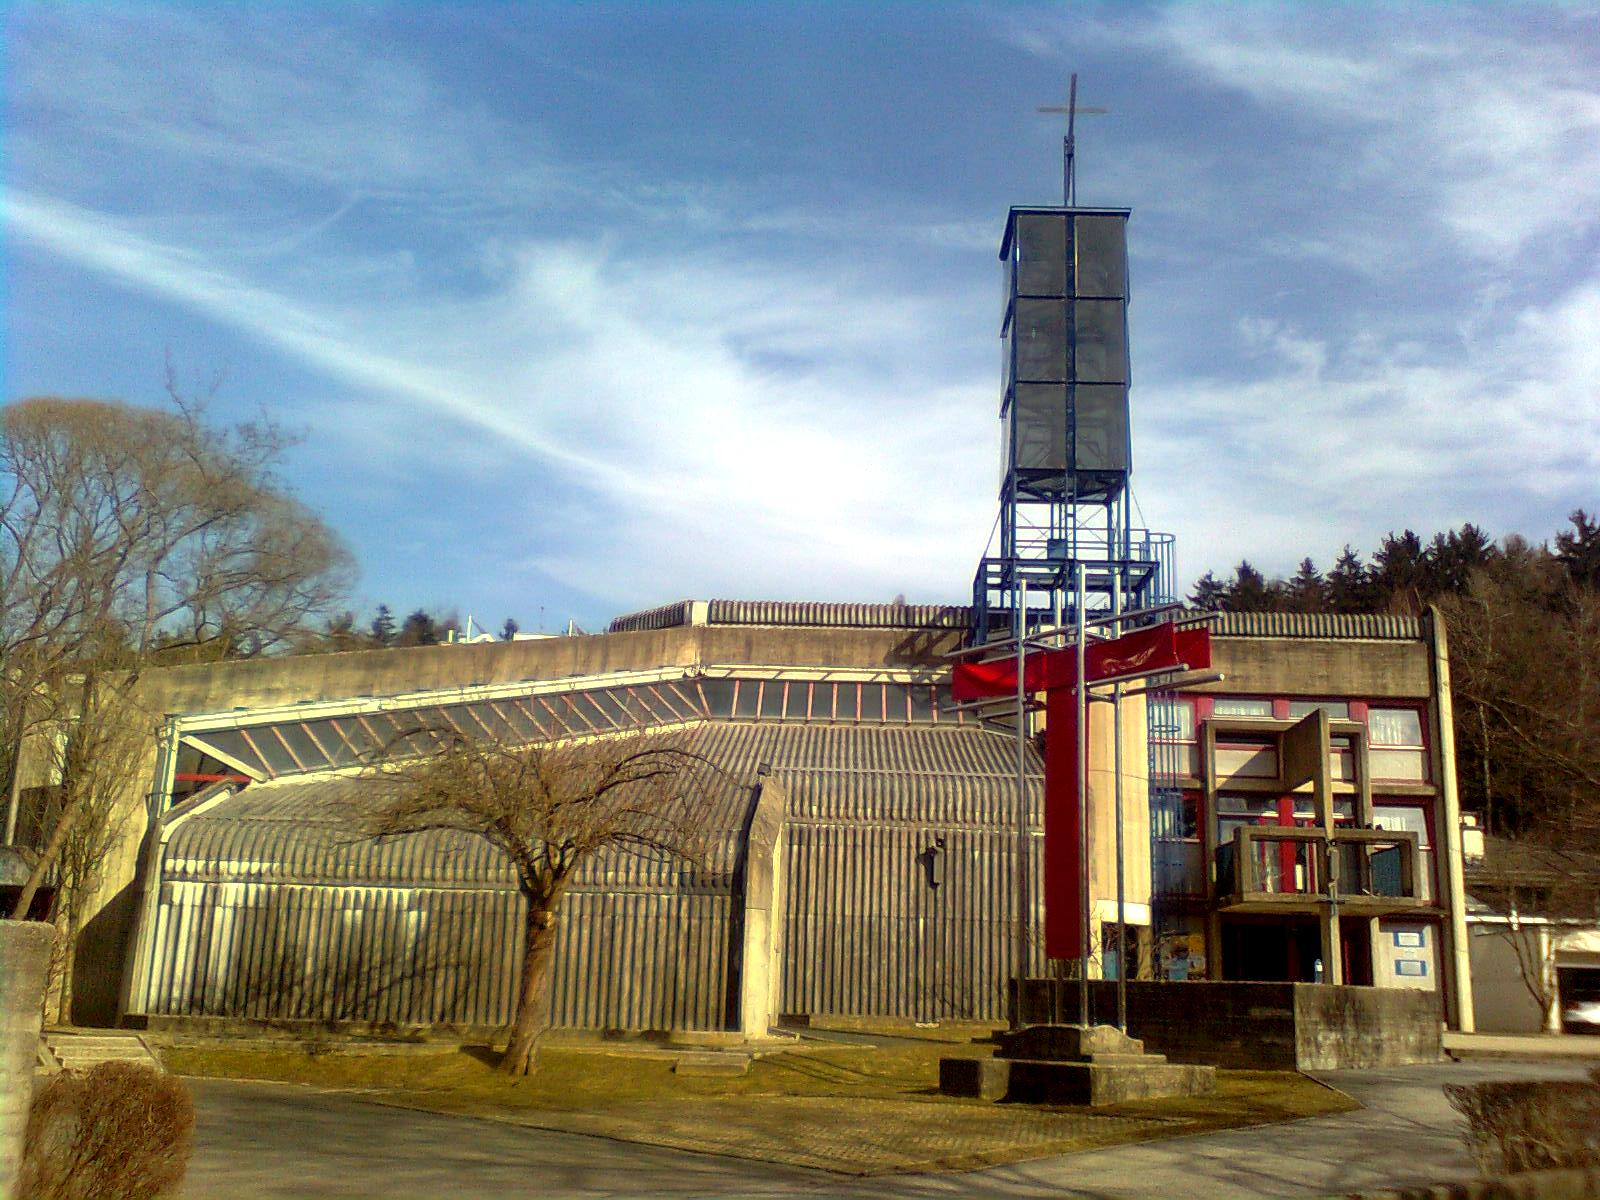 Maria Verkündigungskirche in Graz-Kroisbach